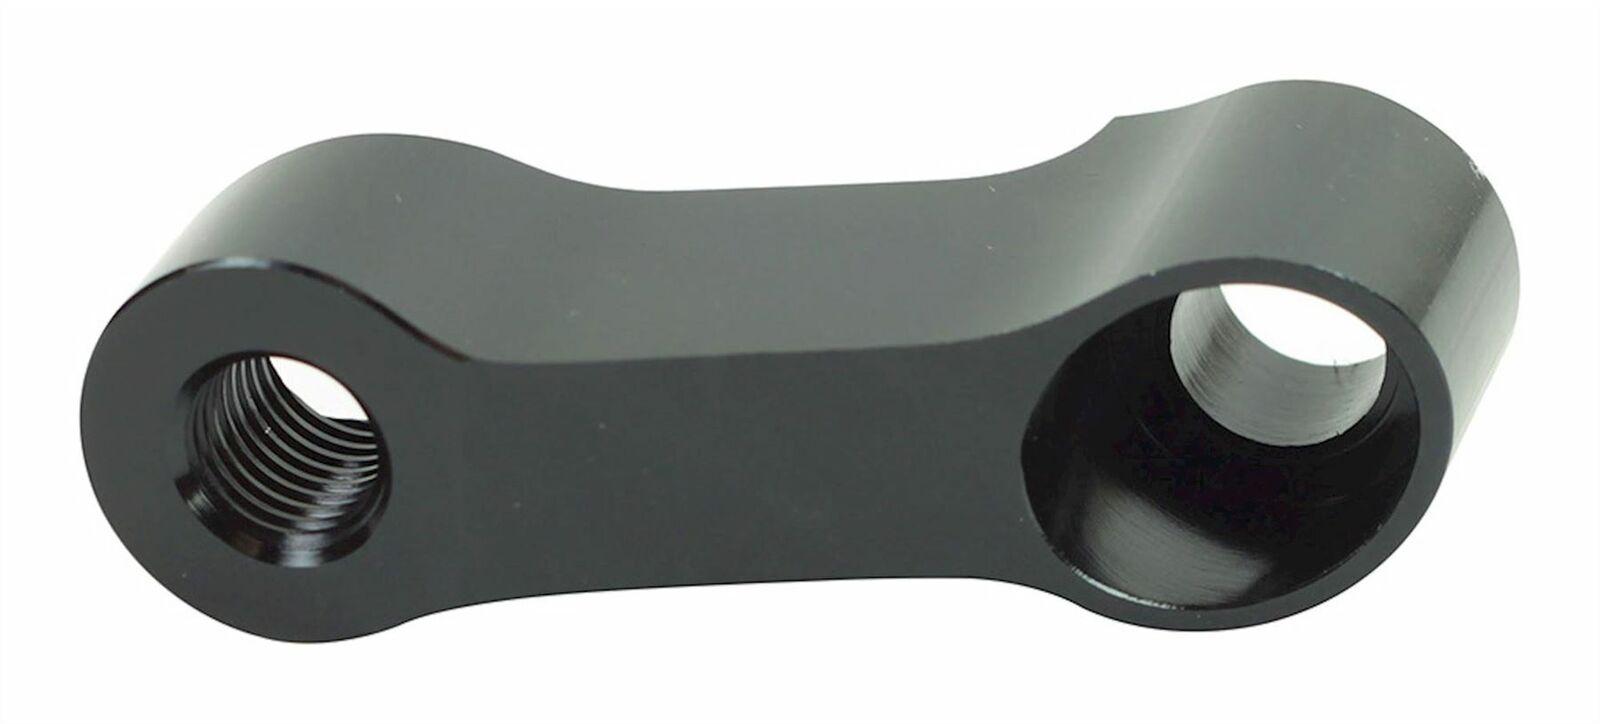 Black Mirror Stem Extension//Extender 10mm Yamaha Right Hand Side 40mm Reach